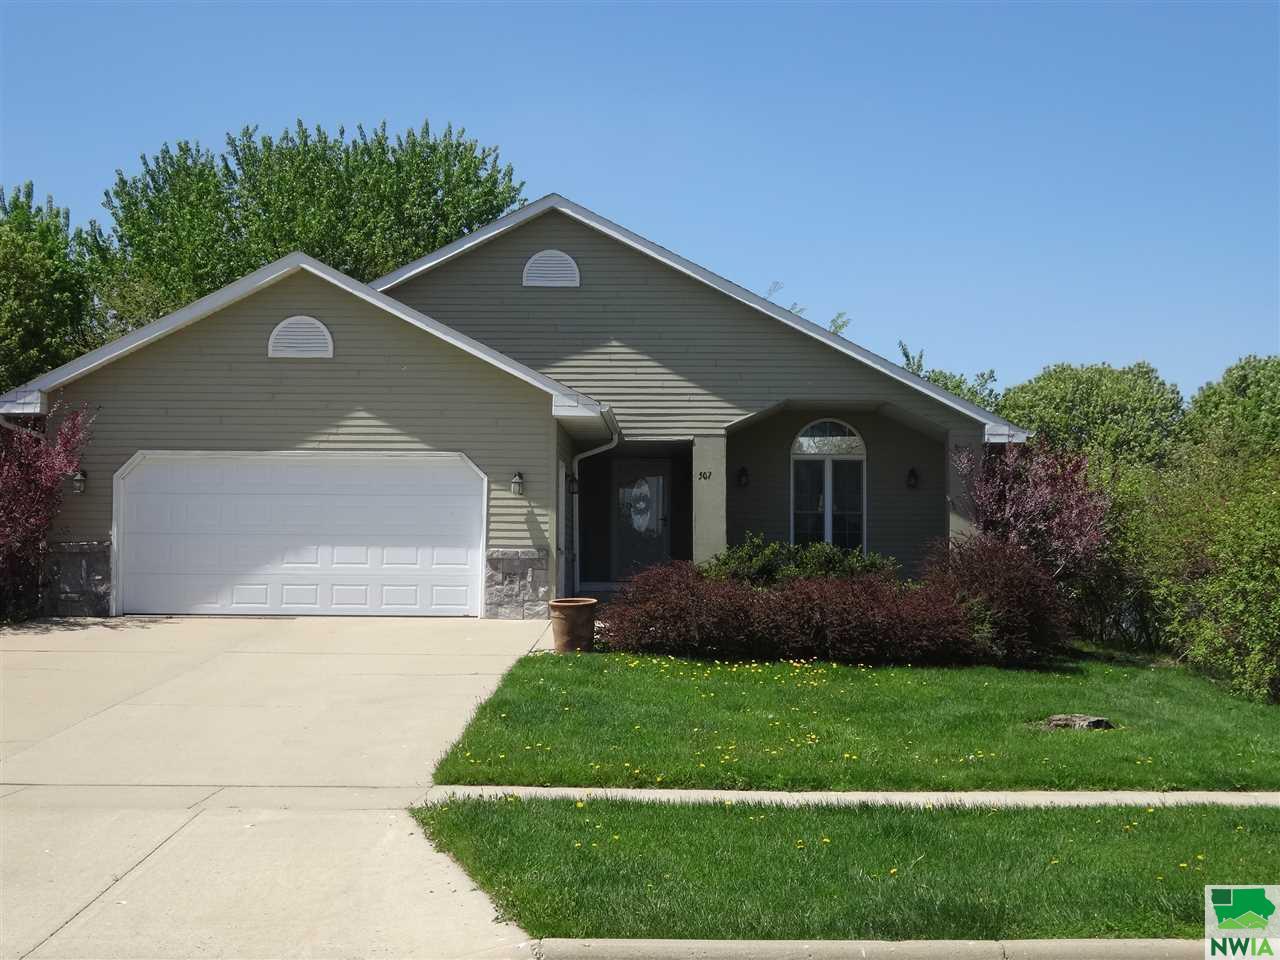 Property for sale at 507 Pinehurst, Vermillion,  SD 57069